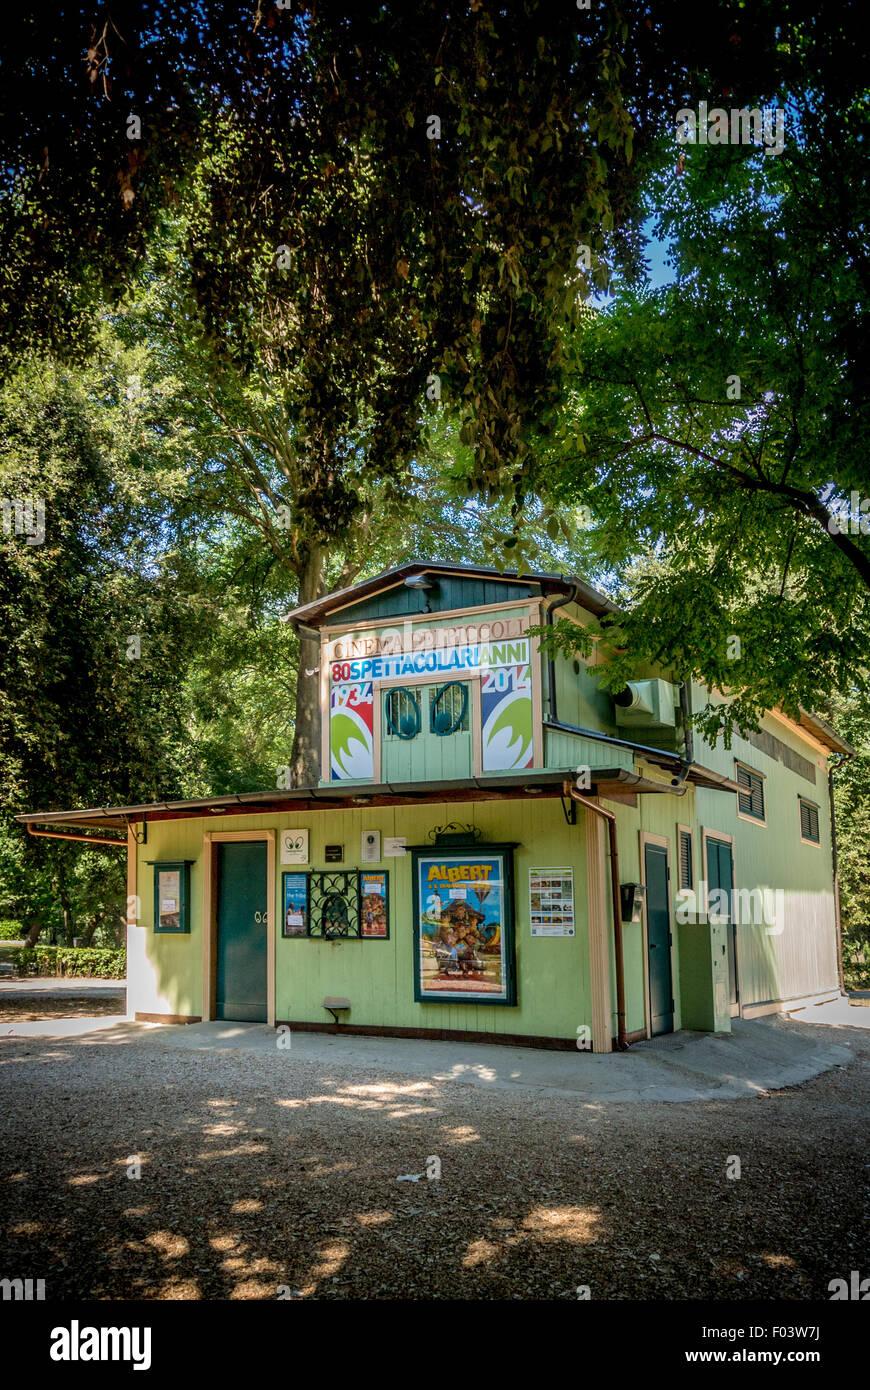 Le cinéma dei Piccoli, Jardins Borghese, Rome, Italie. Photo Stock